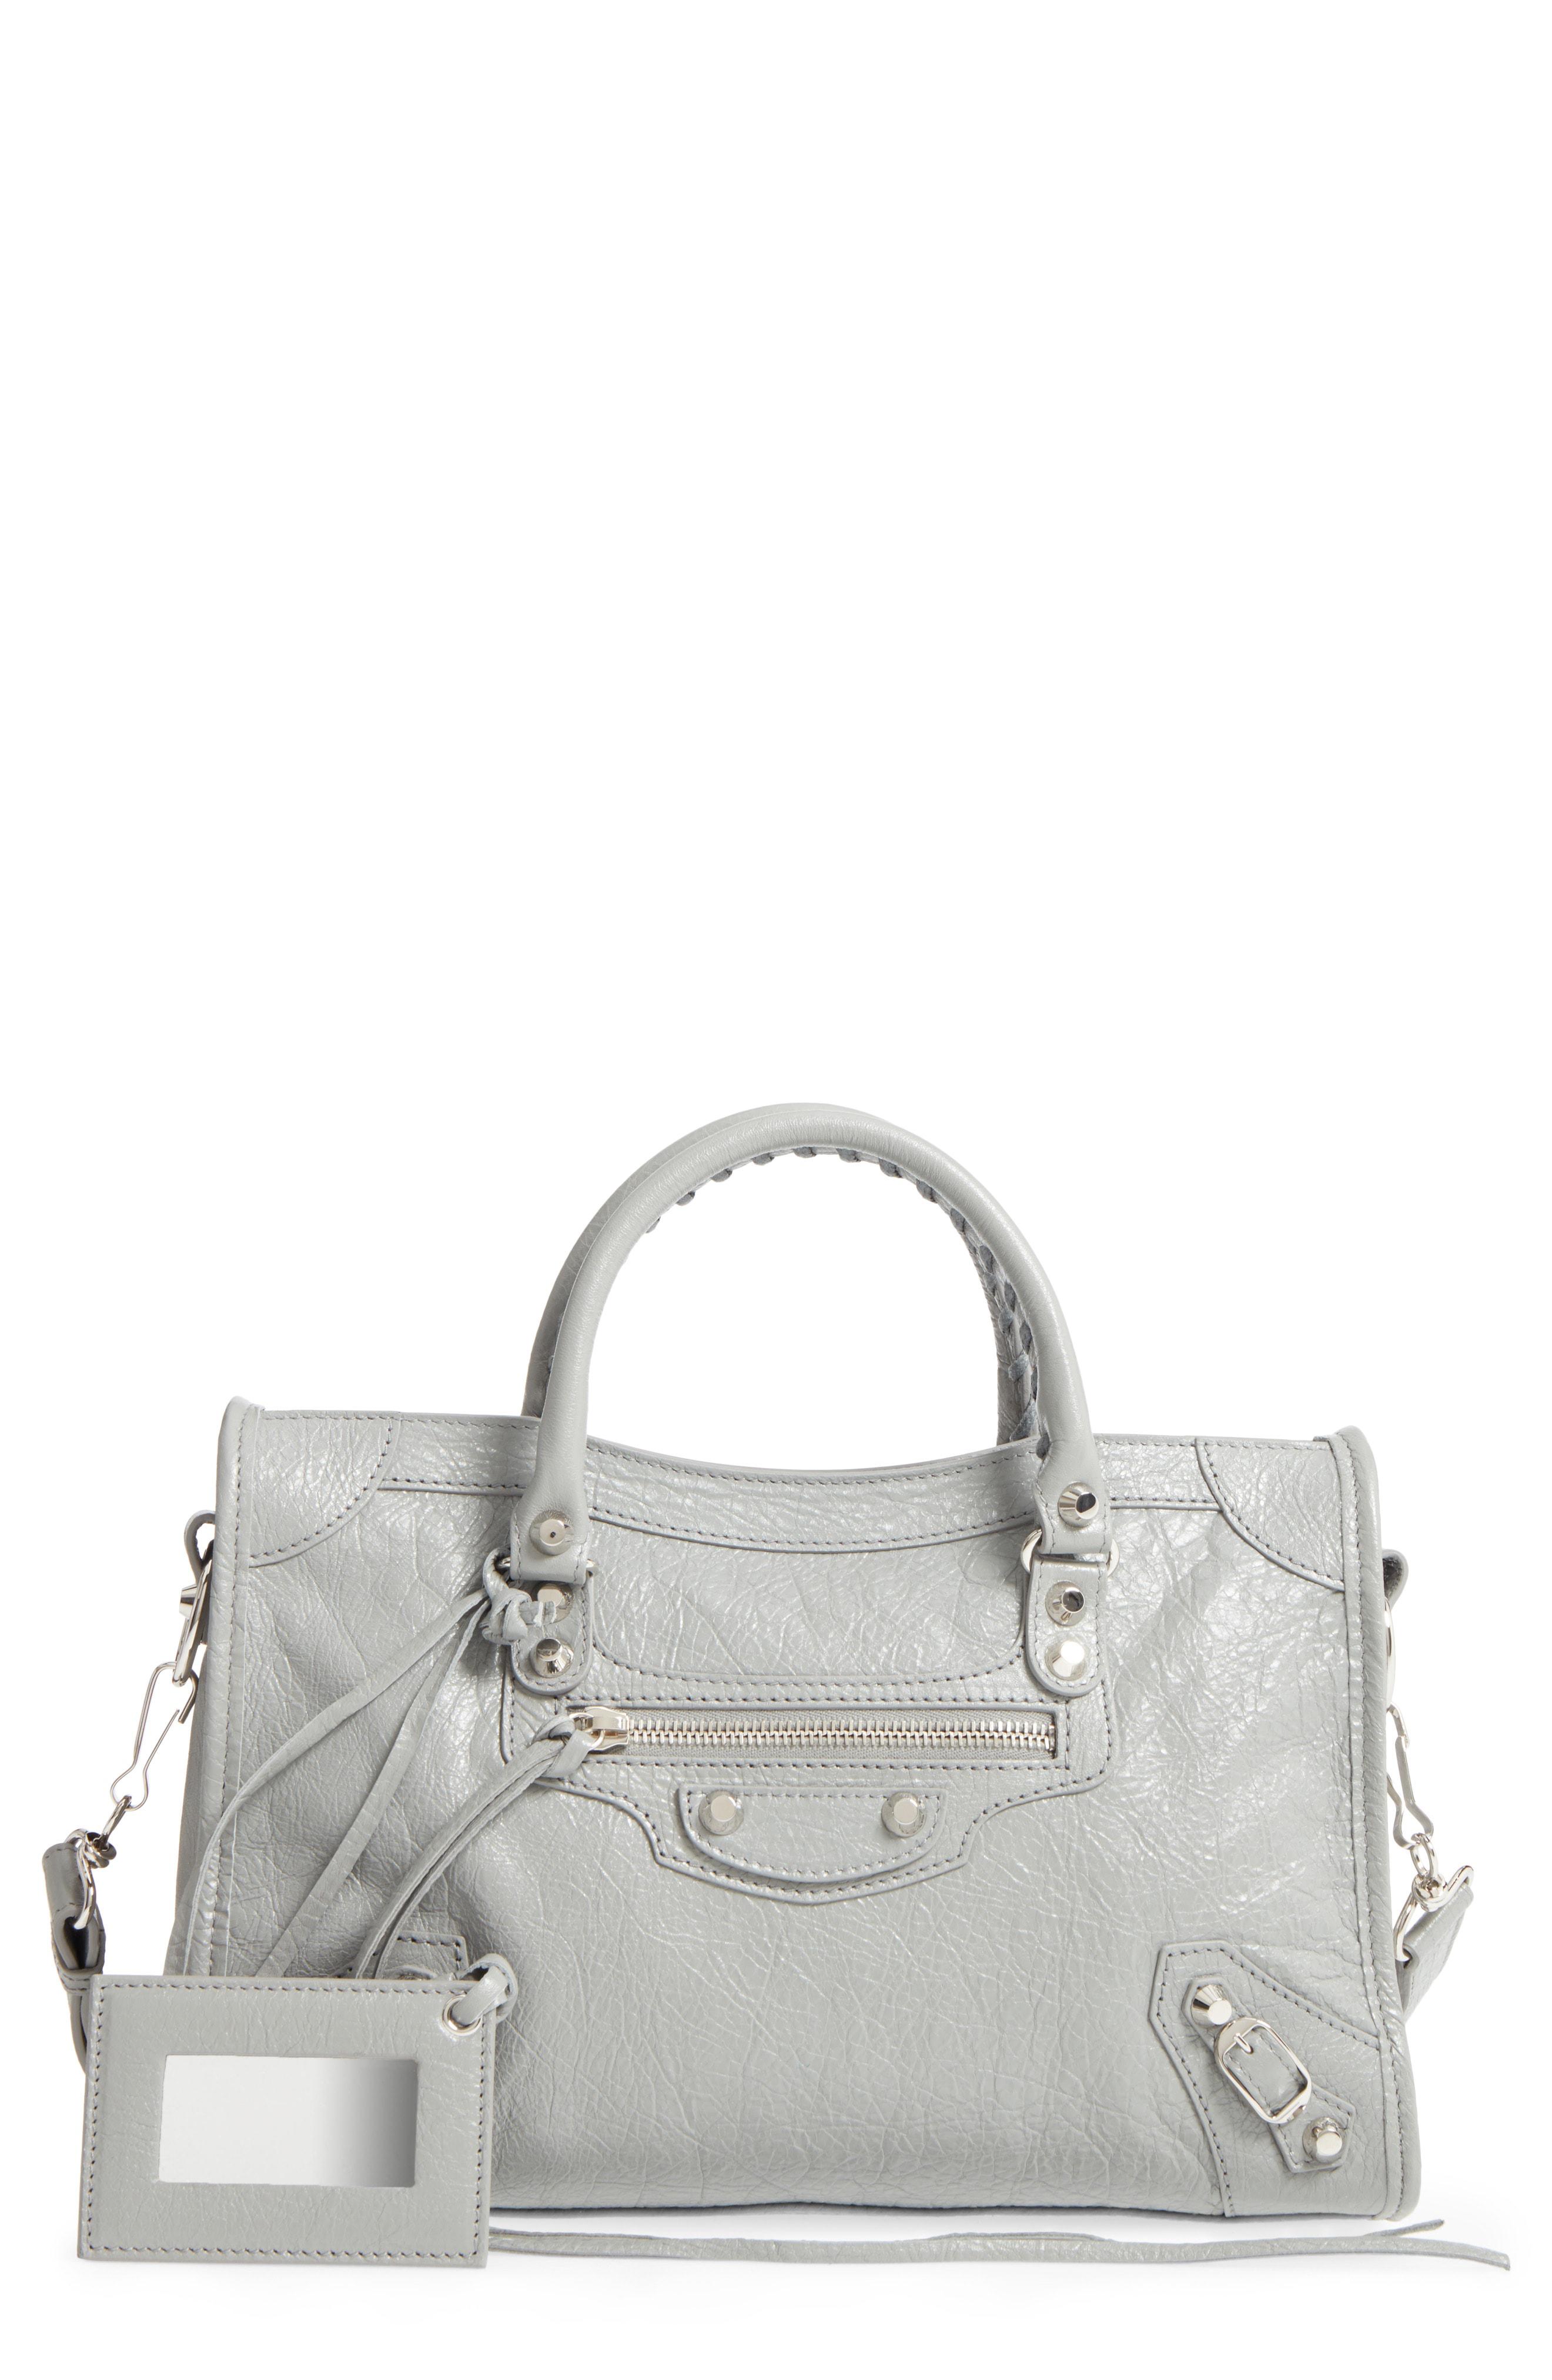 8840527a25d5e Balenciaga Small Classic City Leather Tote - Grey In Gris Haussman ...